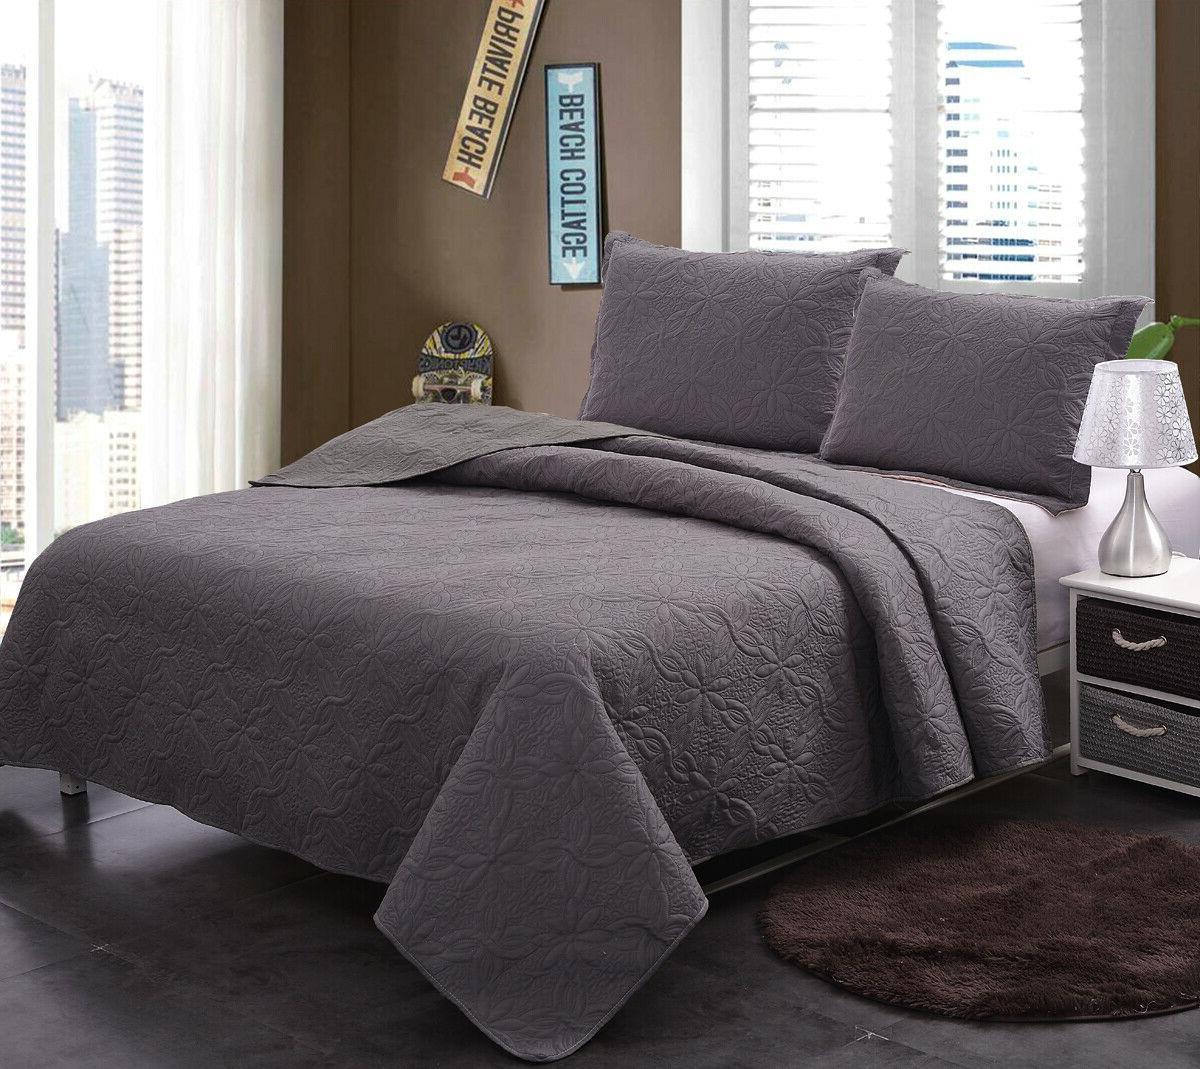 Bedspread Quilt Set Soft Microfiber Lightweight Coverlet Qui